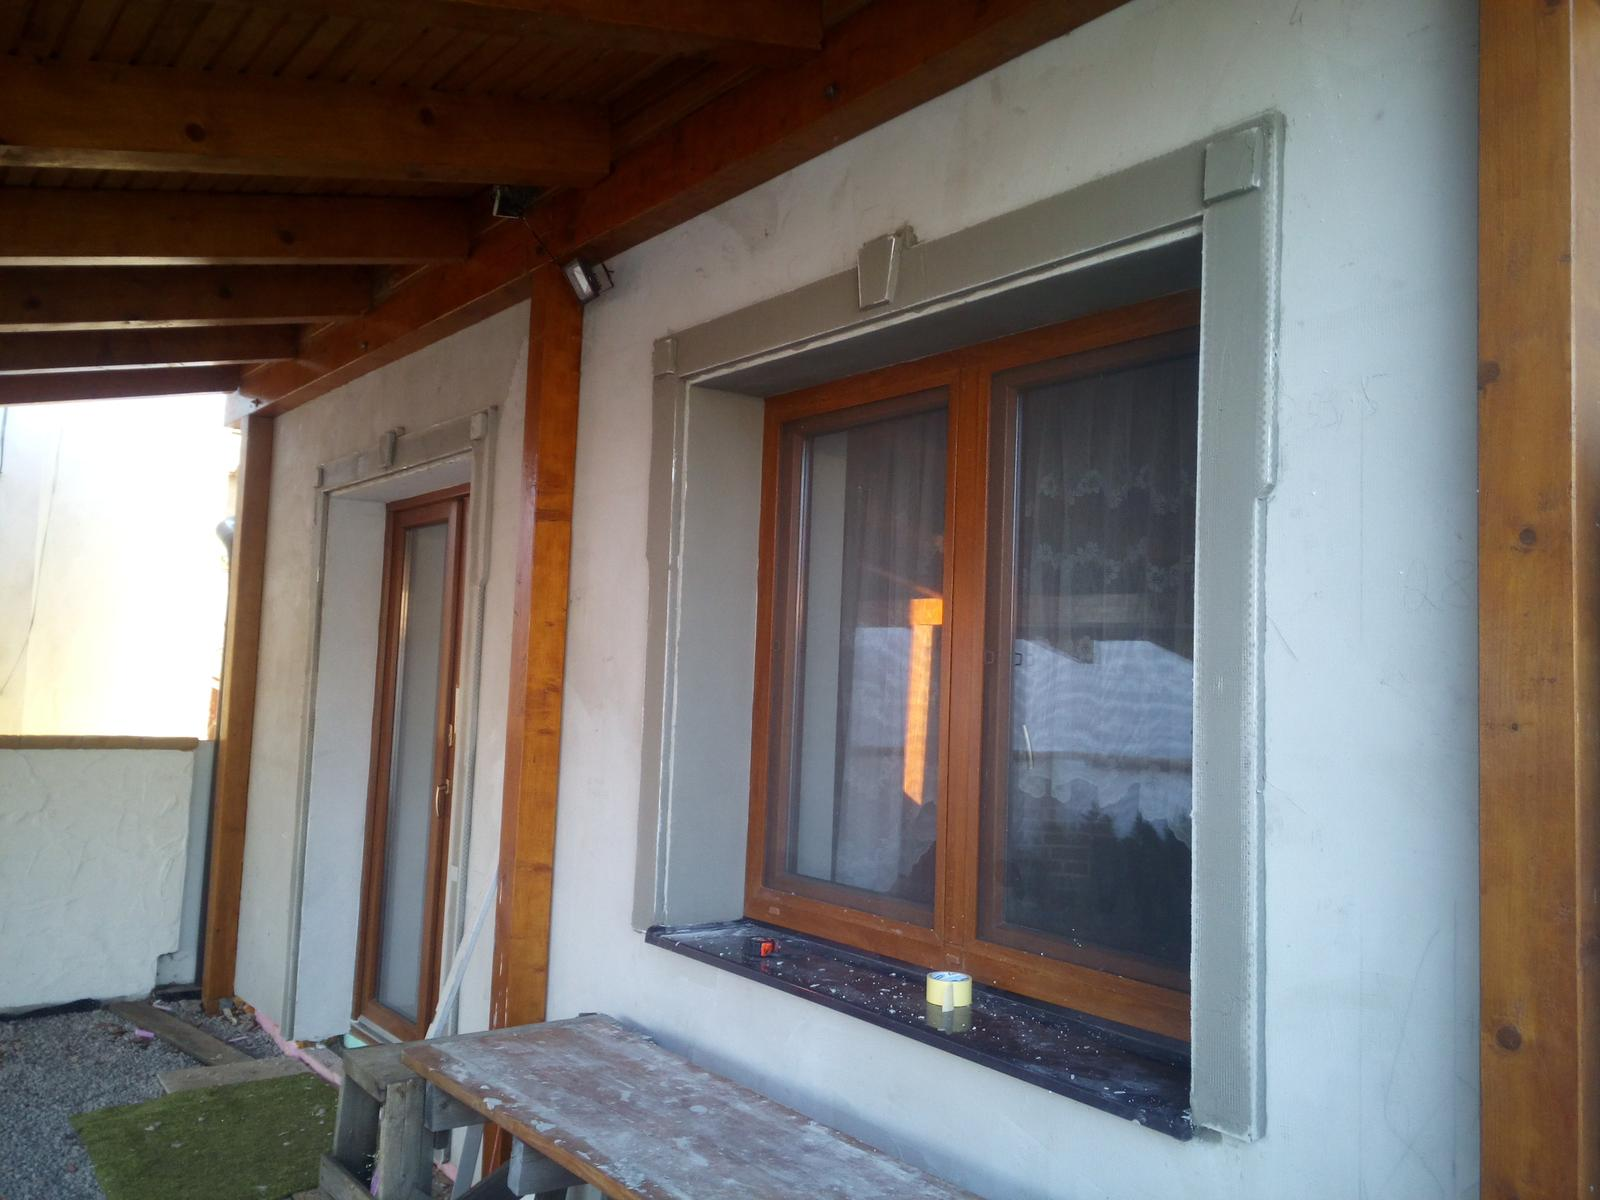 Rekonštrukcia starého domčeka - Zatiaľ nedokončené lezenky okolo okien.